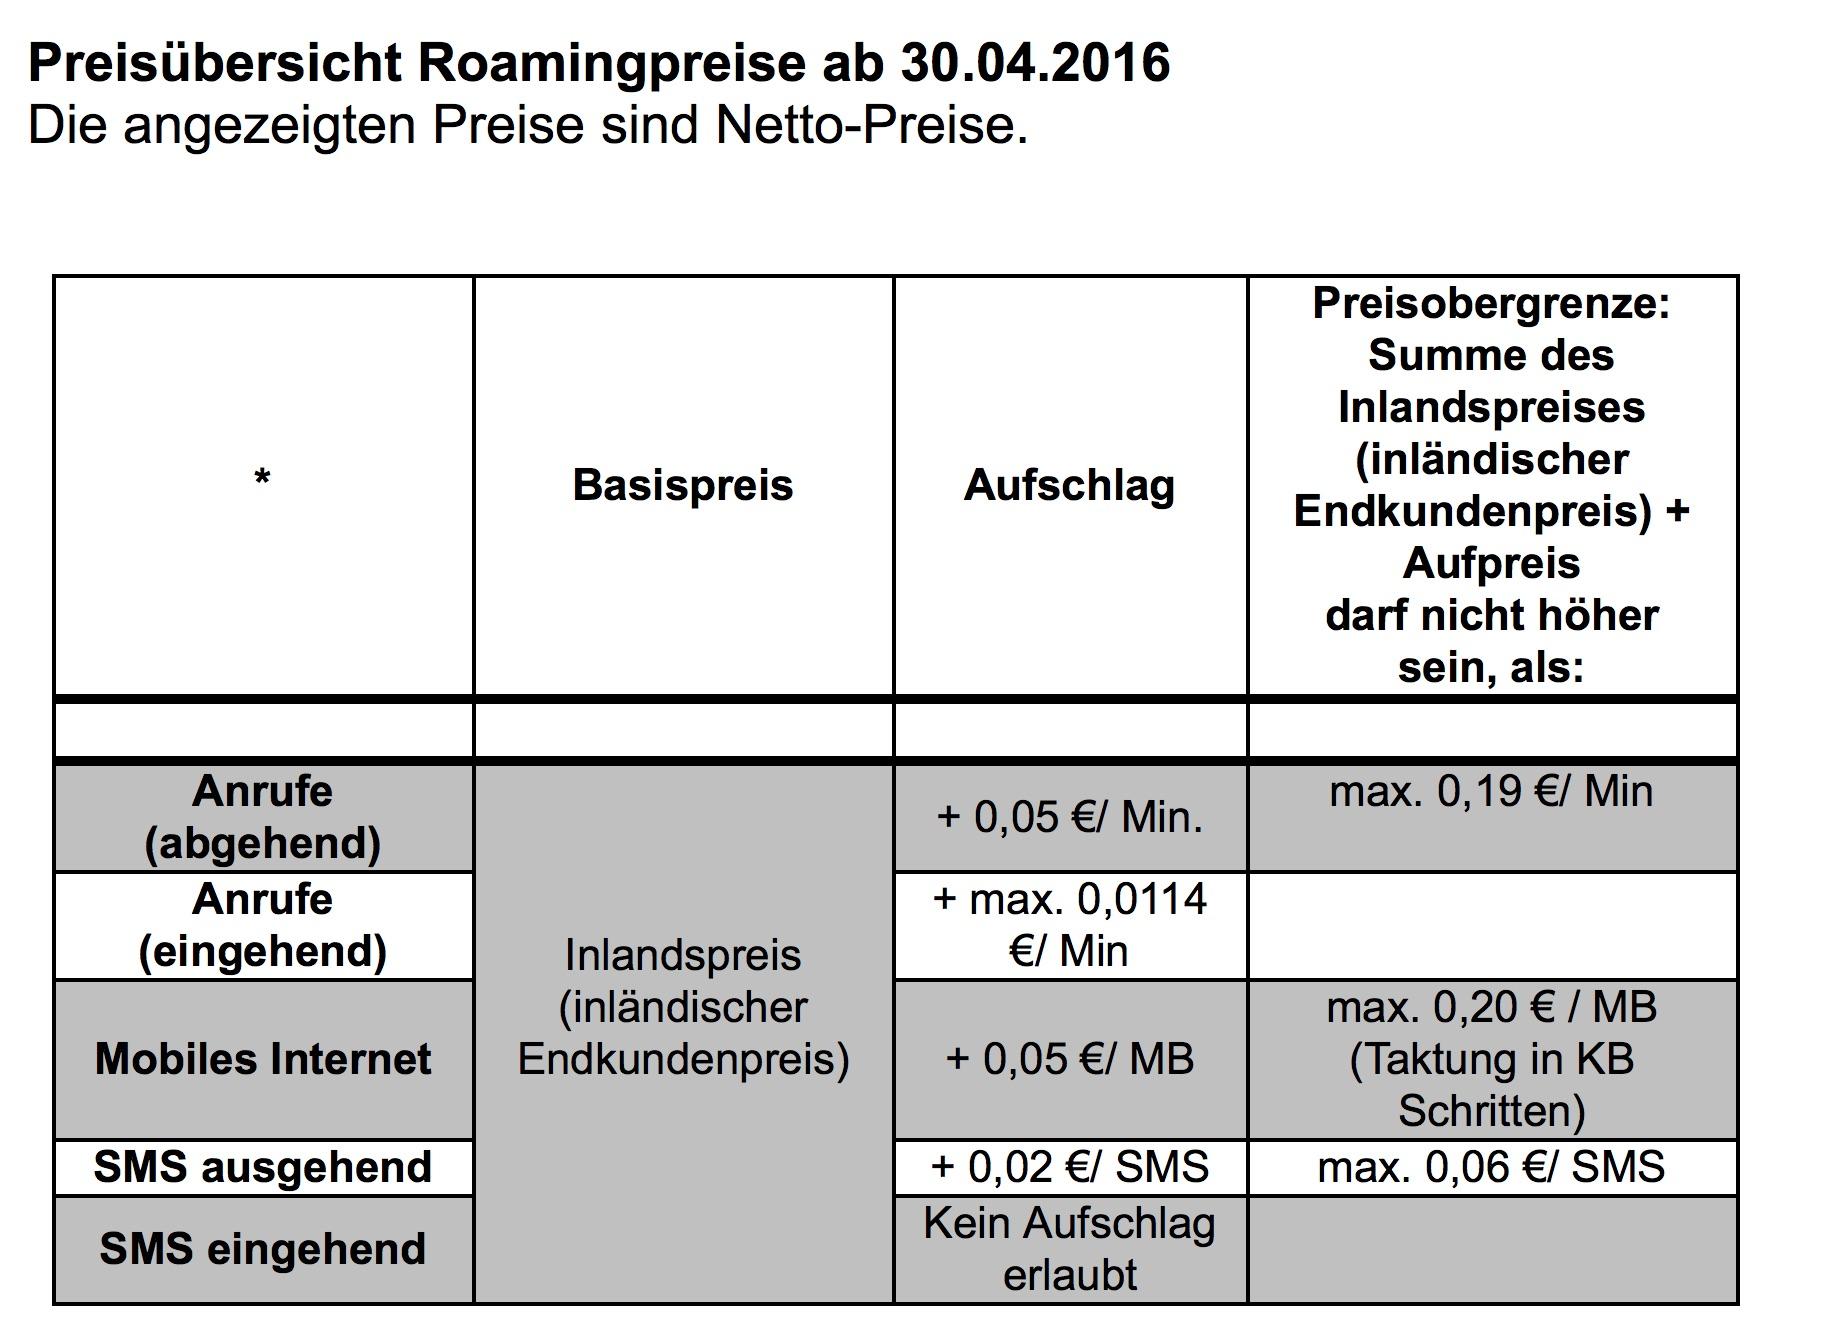 Roamingpreise ab 30.04.2016